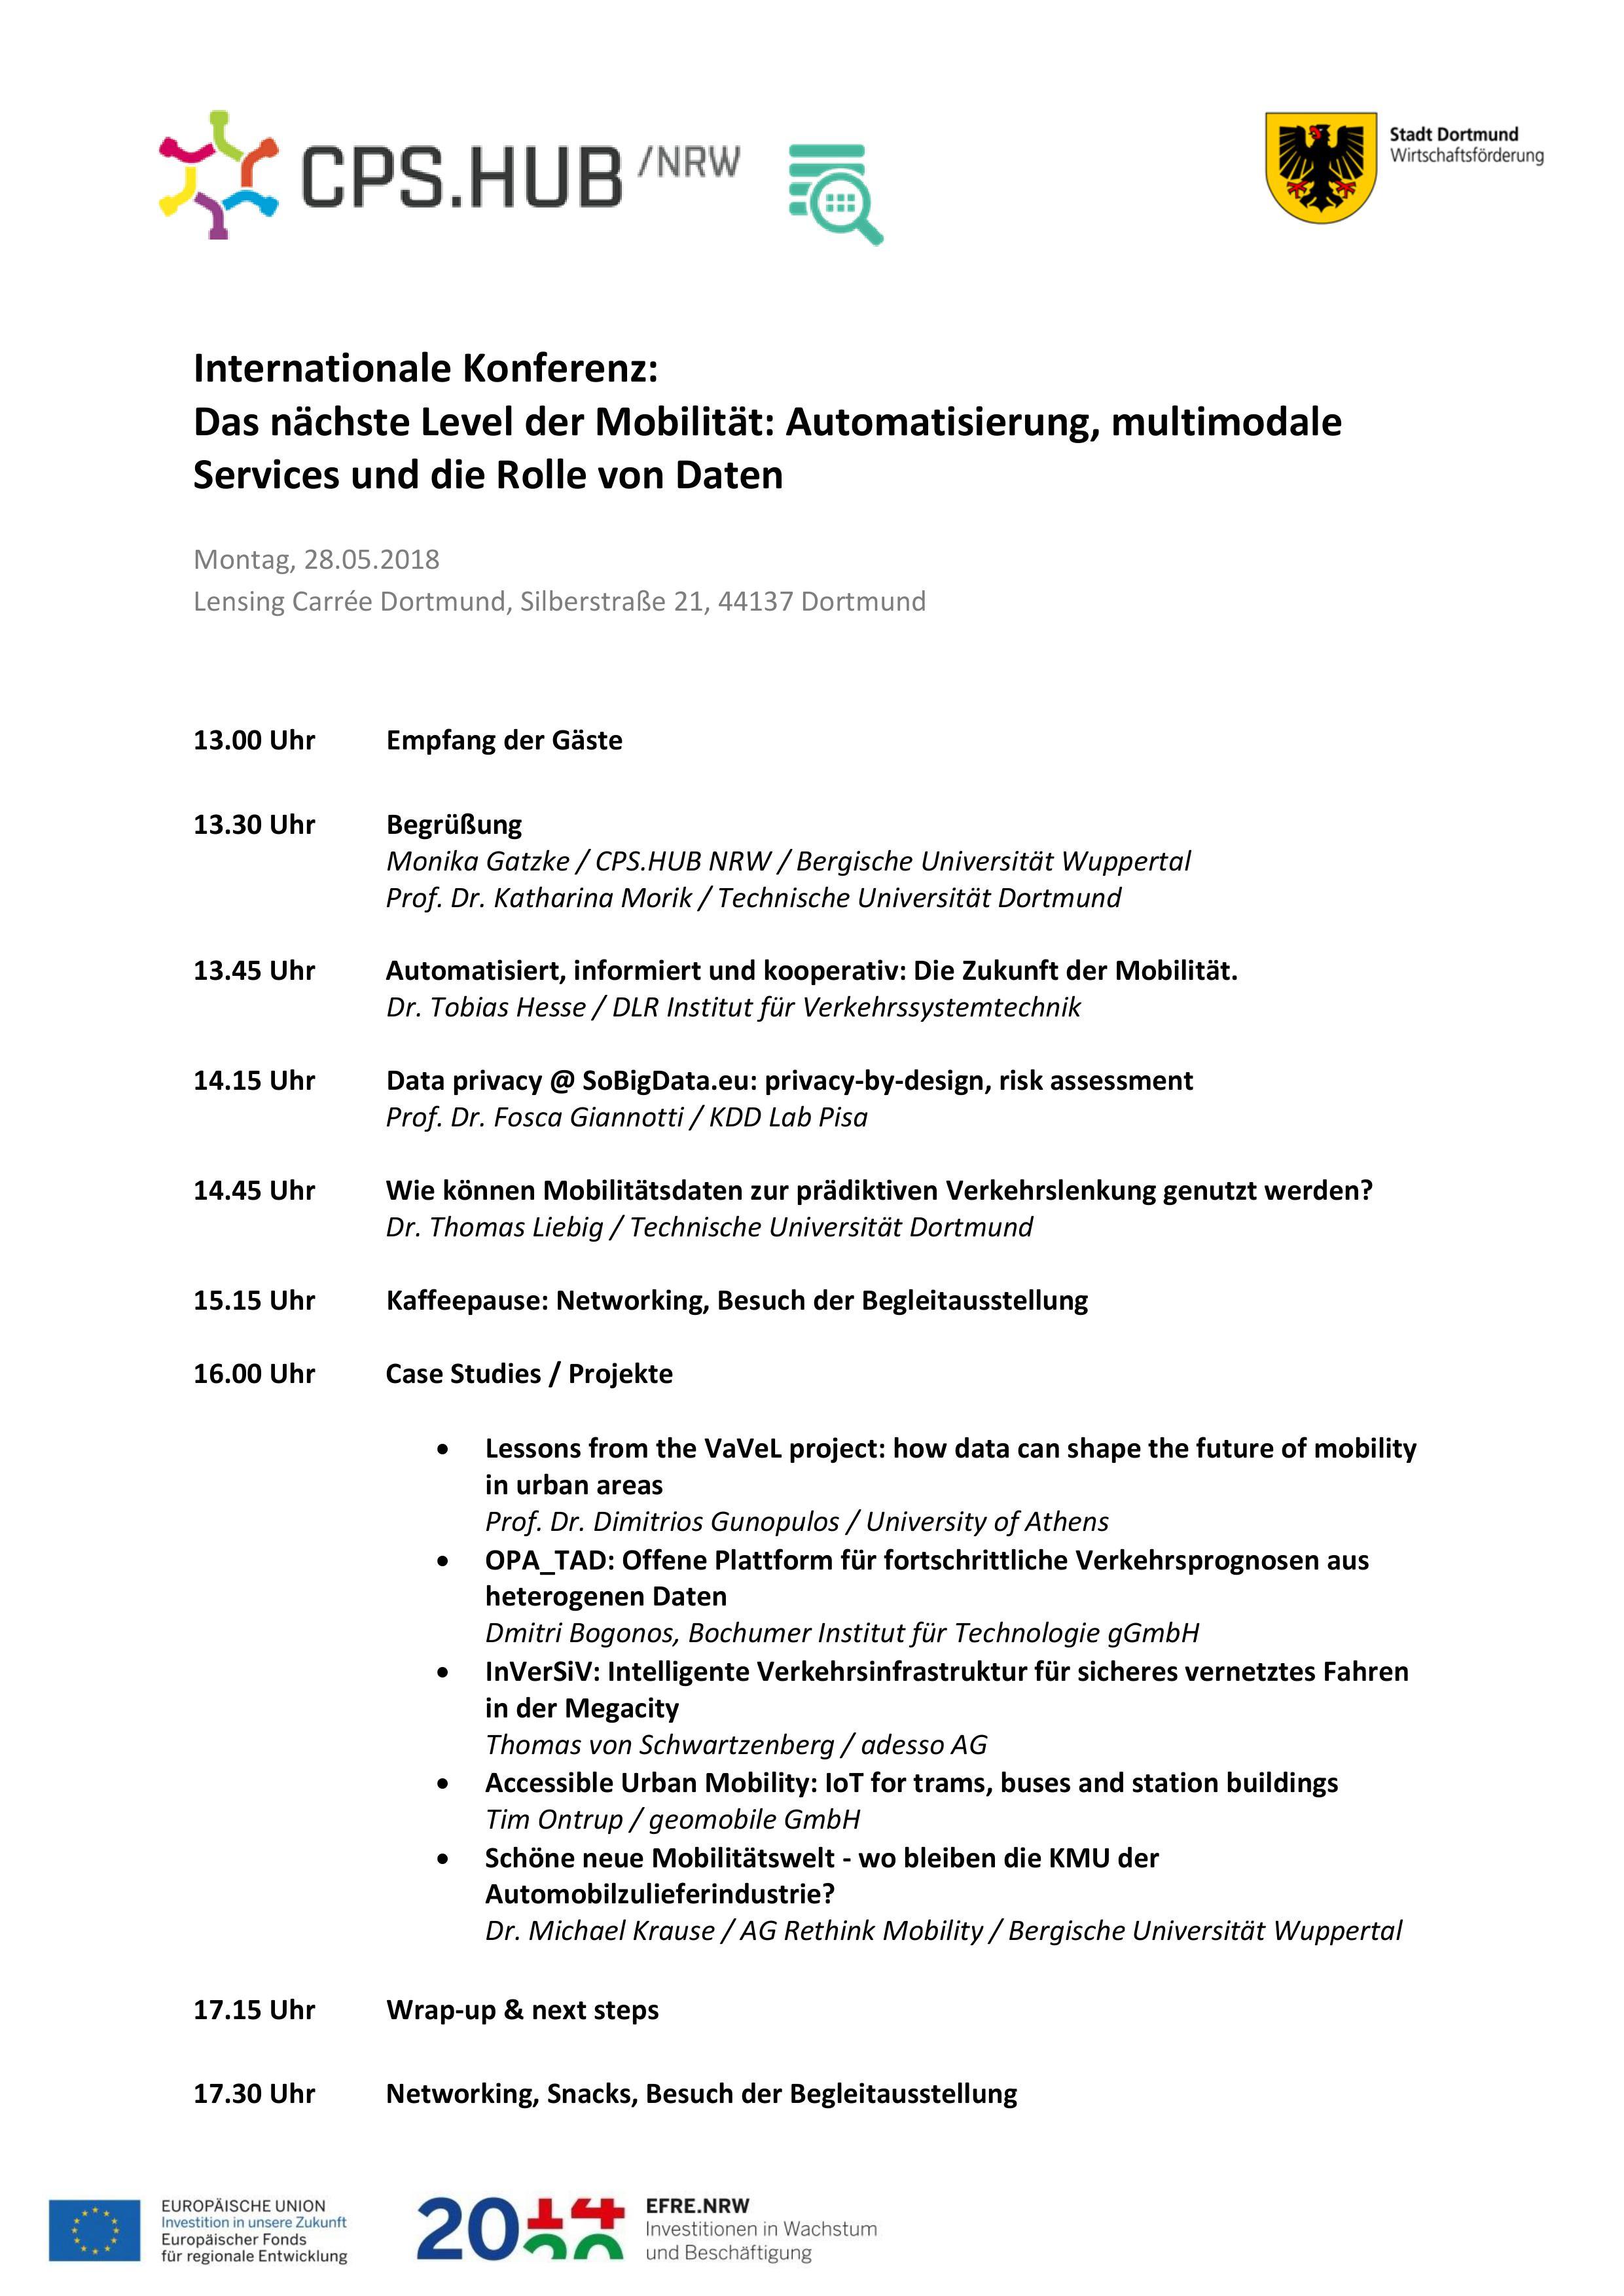 TU Dortmund -- Computer Science VIII